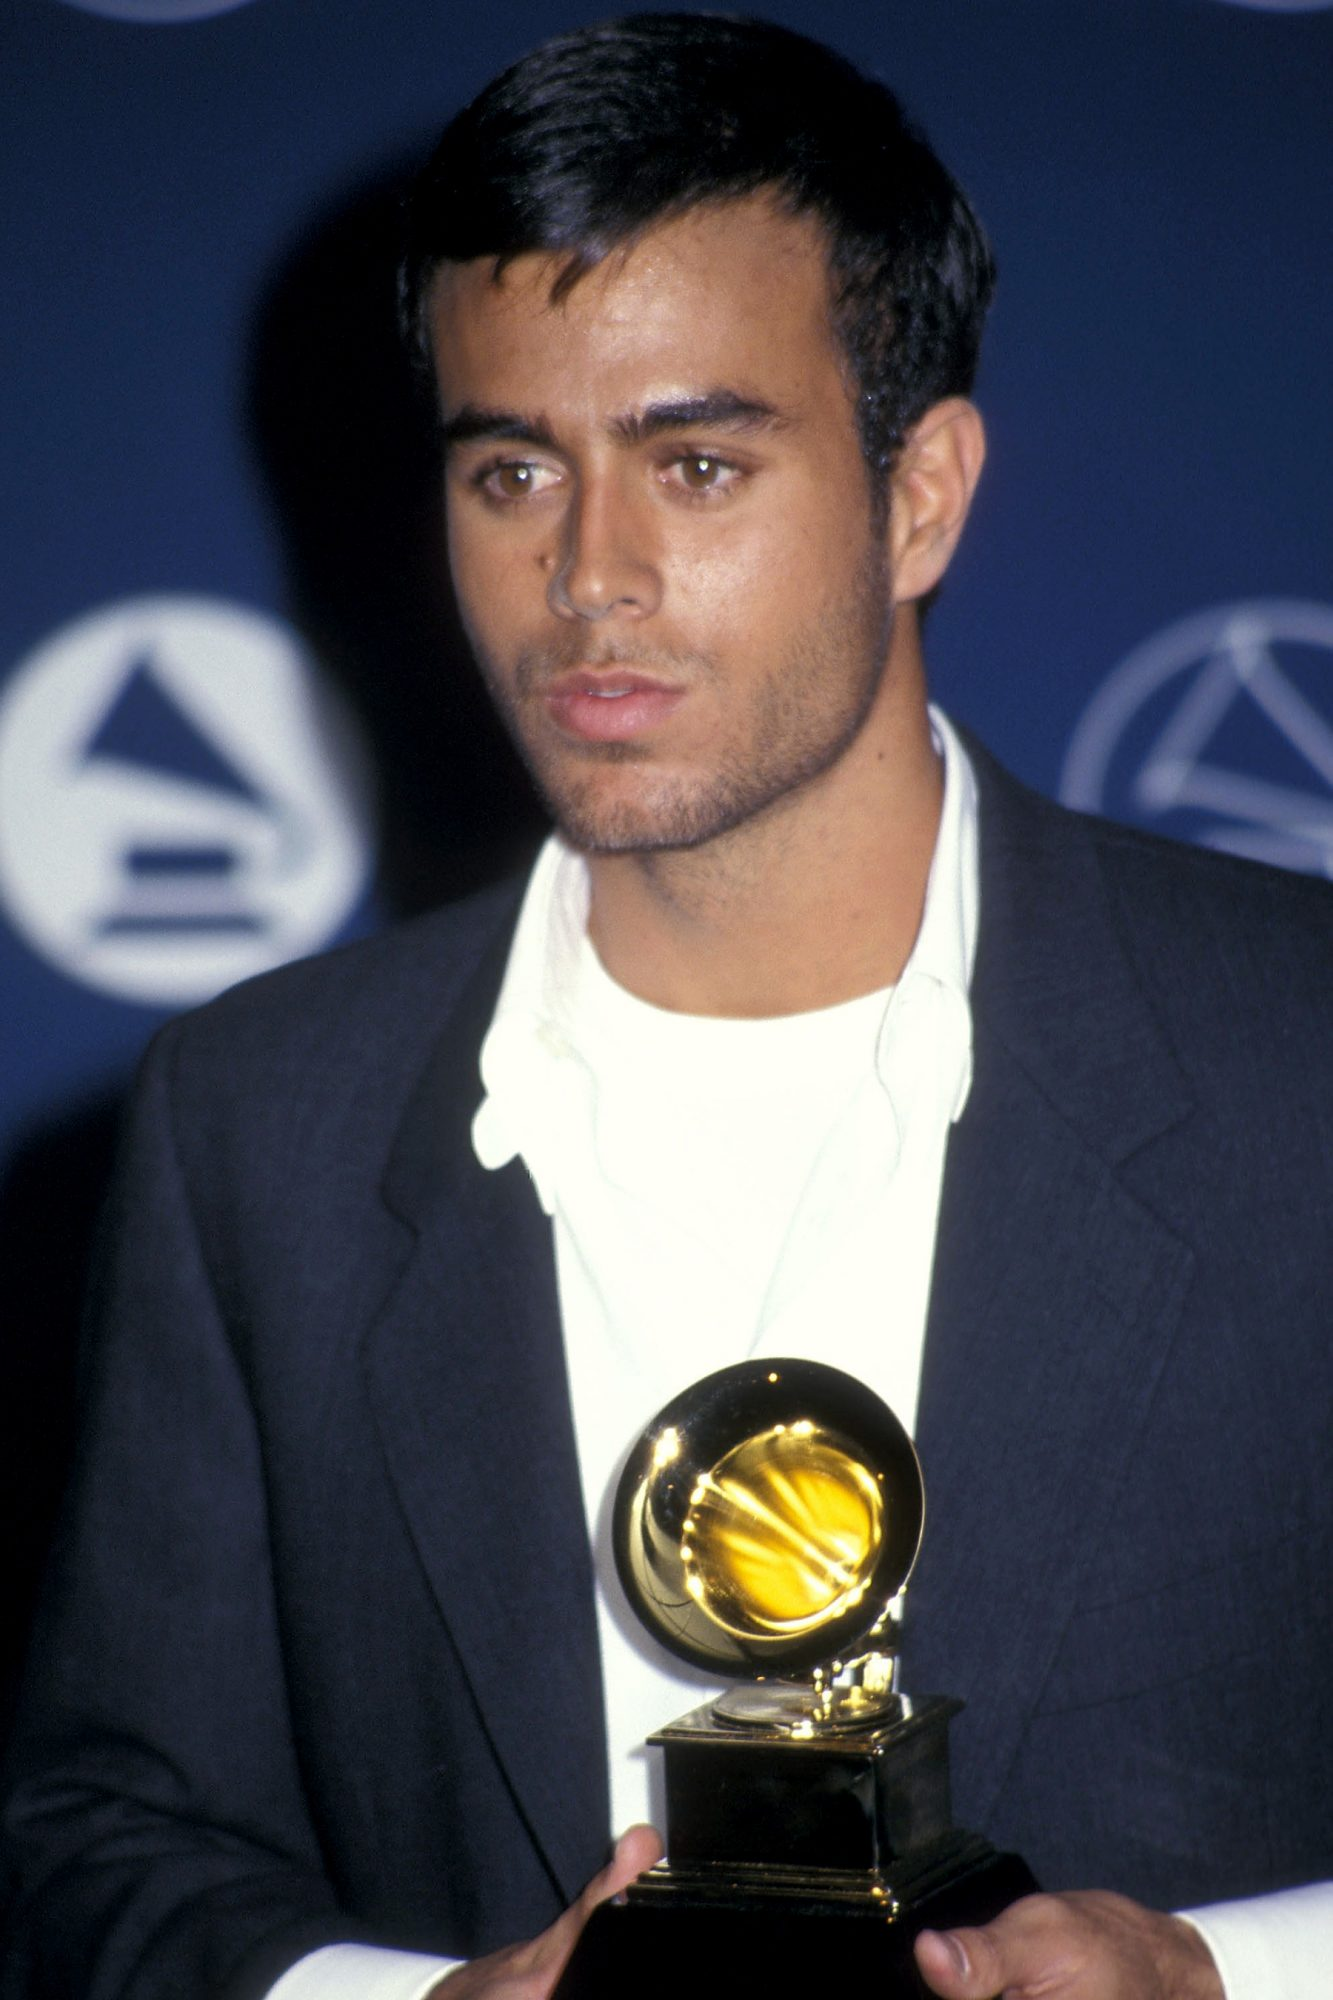 39th Annual Grammy Awards - Press Room